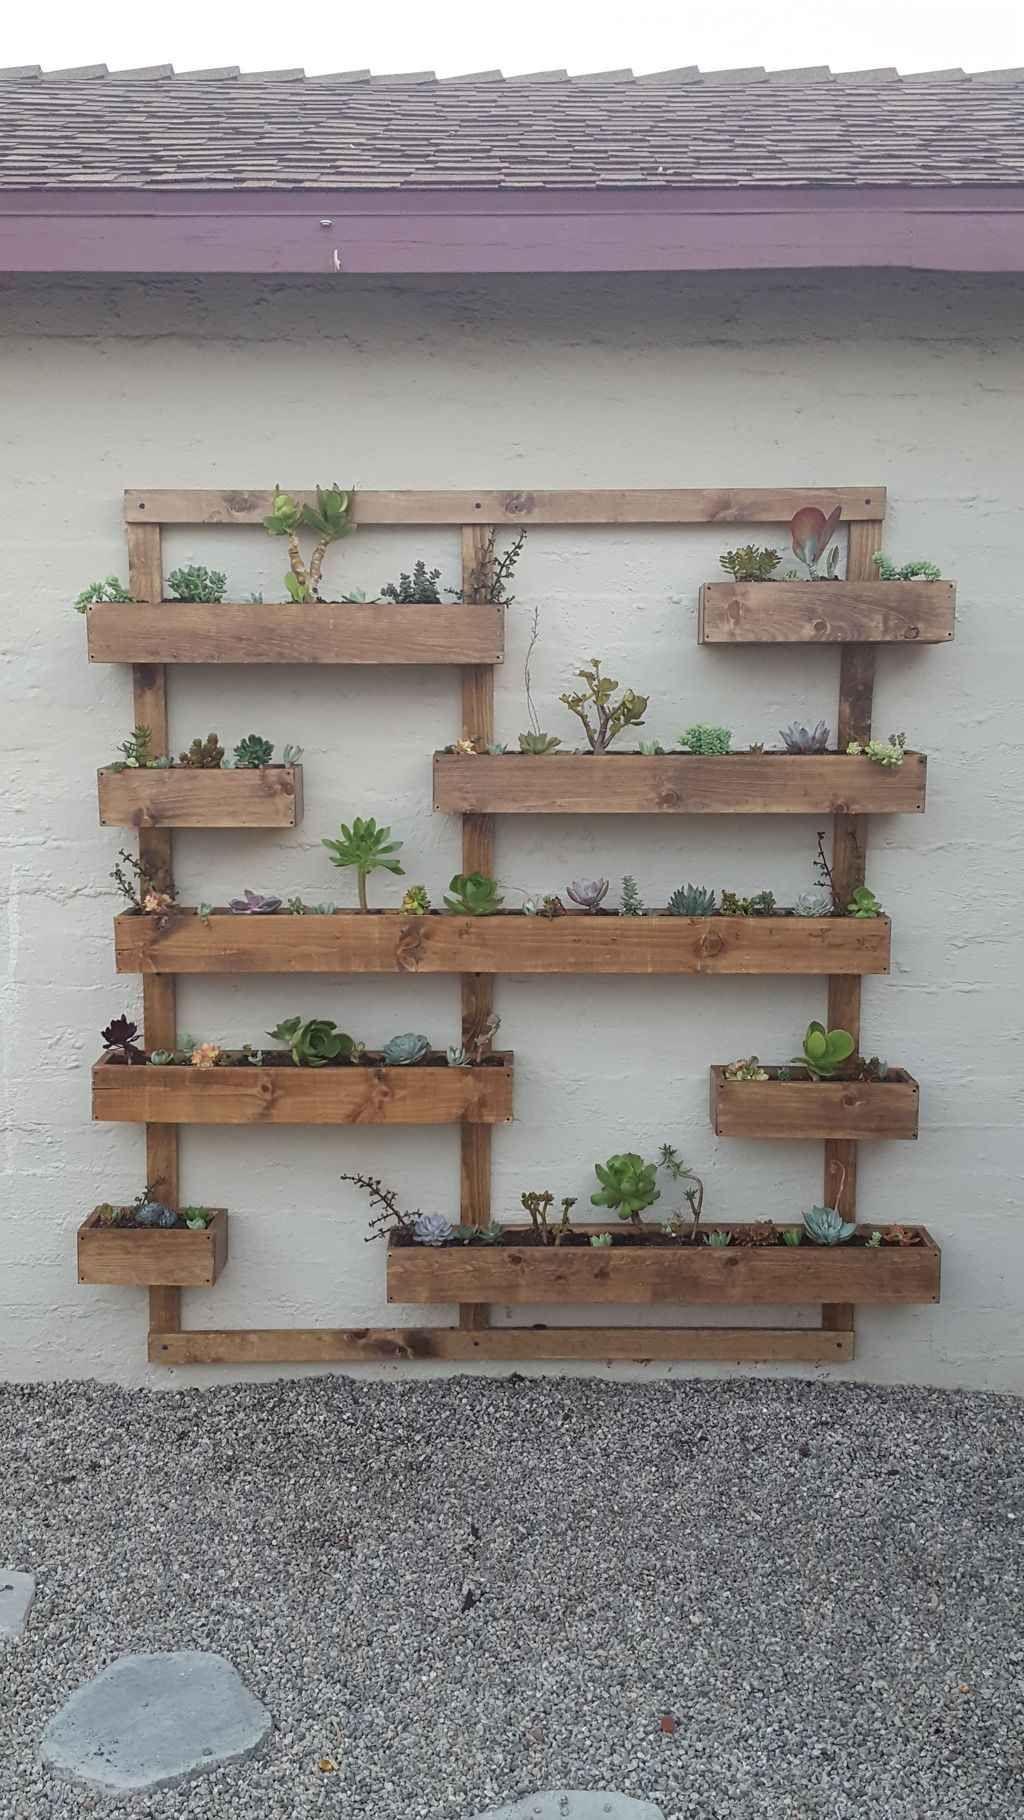 85 Amazing Vertical Garden Ideas For Wall Decorations Garden Wall Decor Vertical Garden Wall Garden Wall Designs